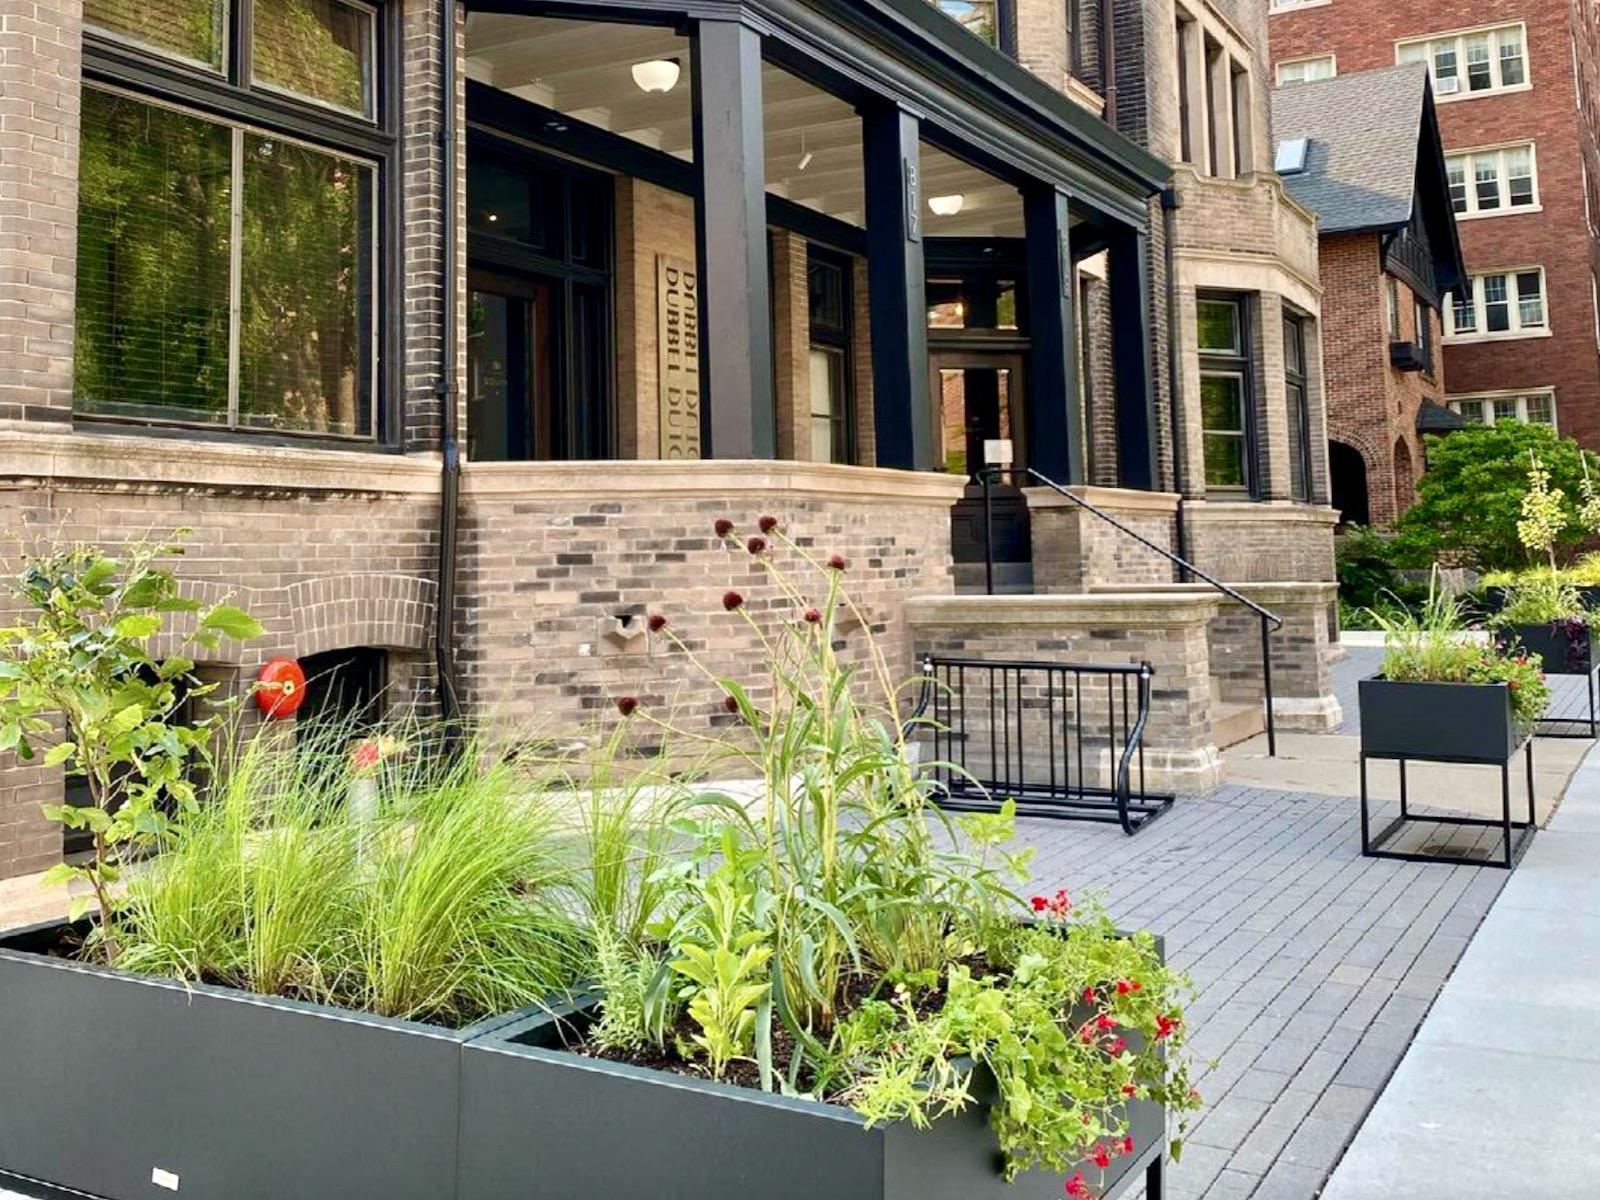 Dubbel Dutch patio